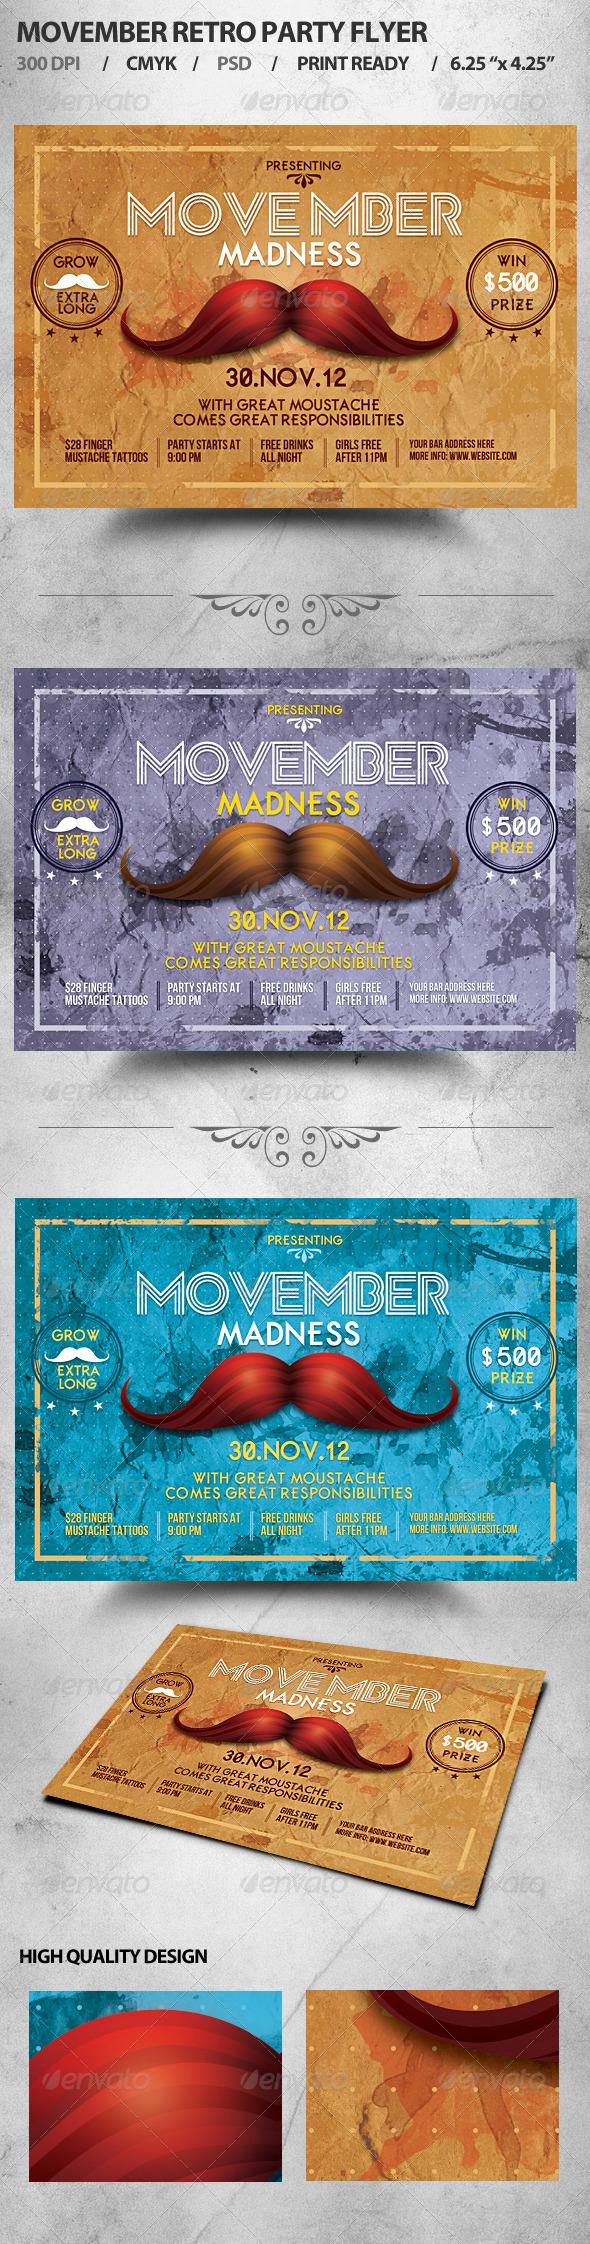 GraphicRiver Retro Movember Party Flyer 3258630